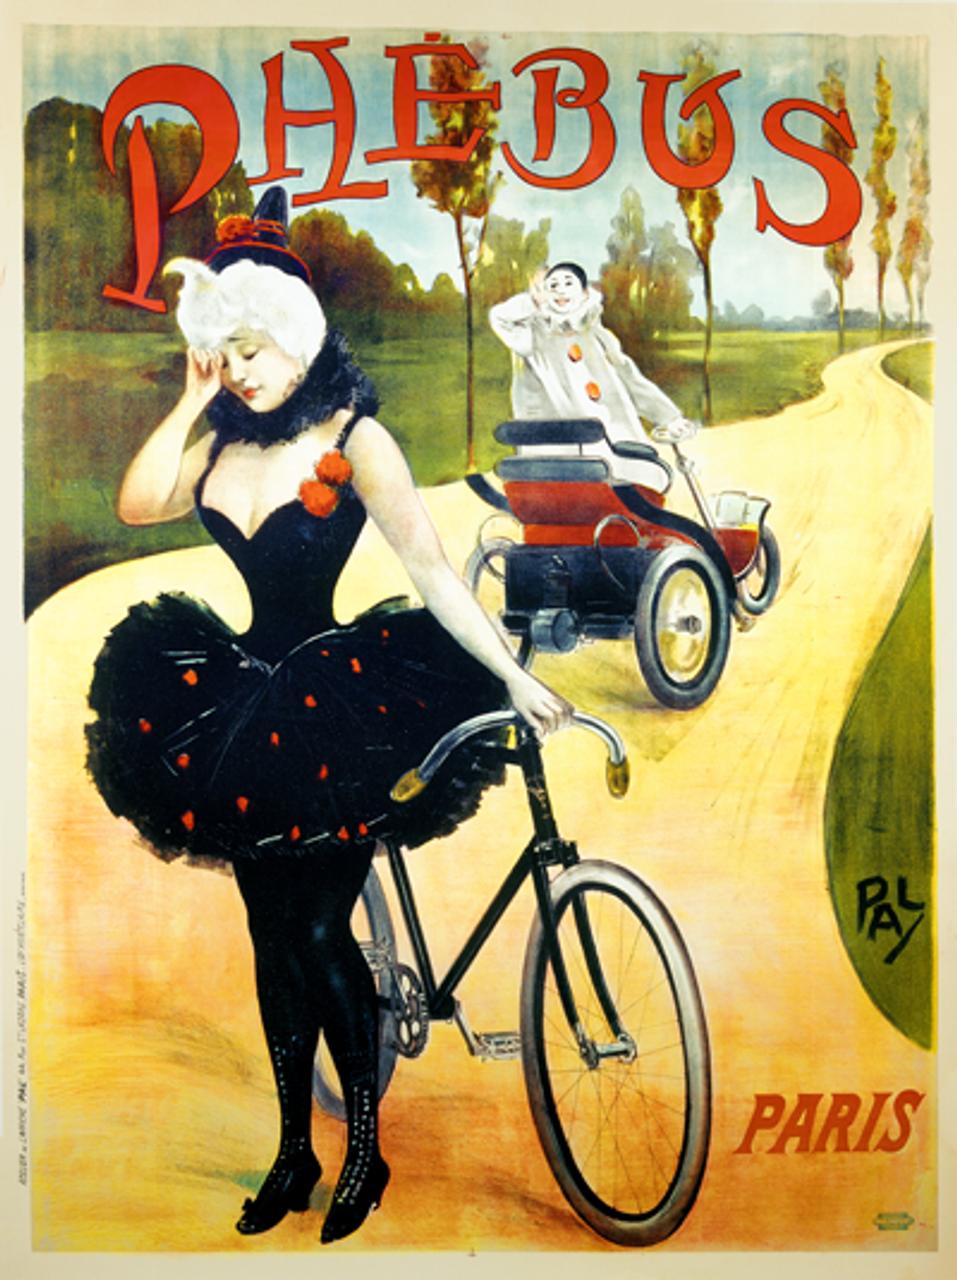 Phebus Poster